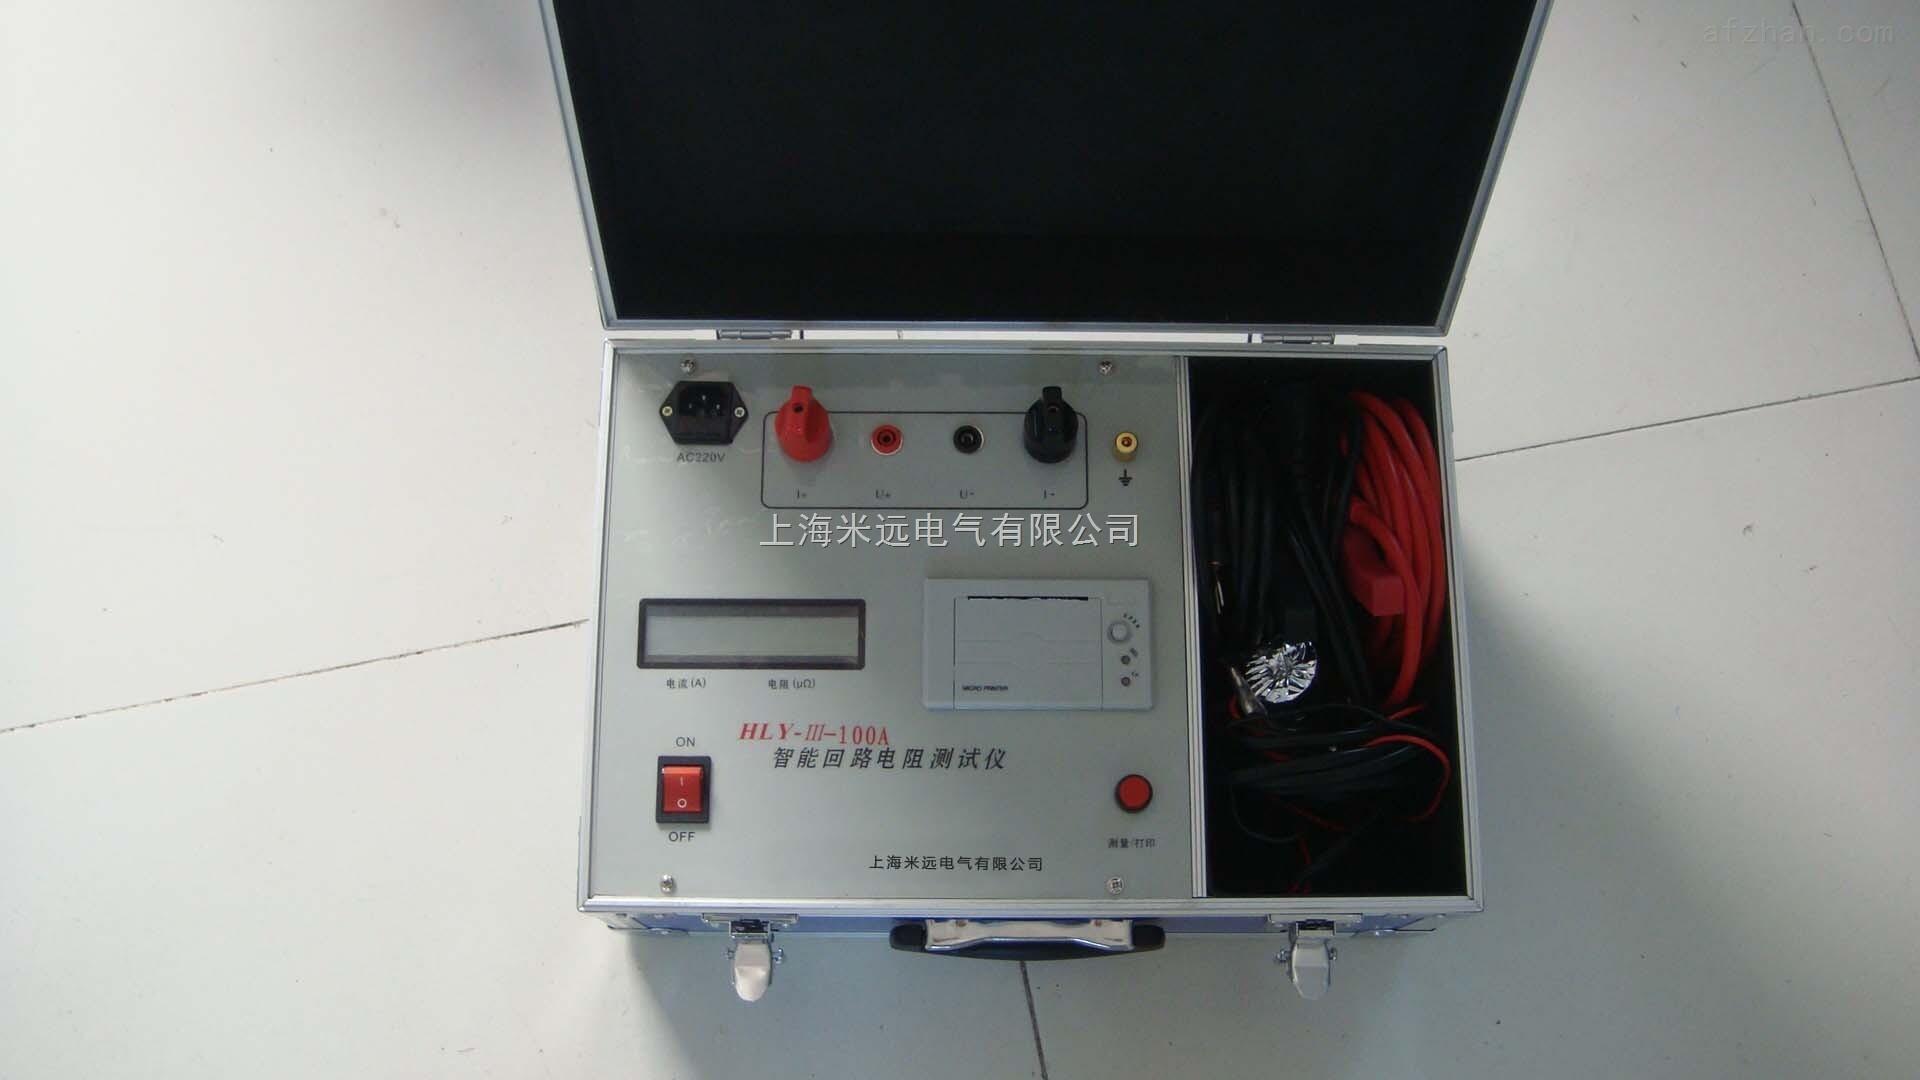 hly-100c-智能回路电阻测试仪-上海米远电气有限公司